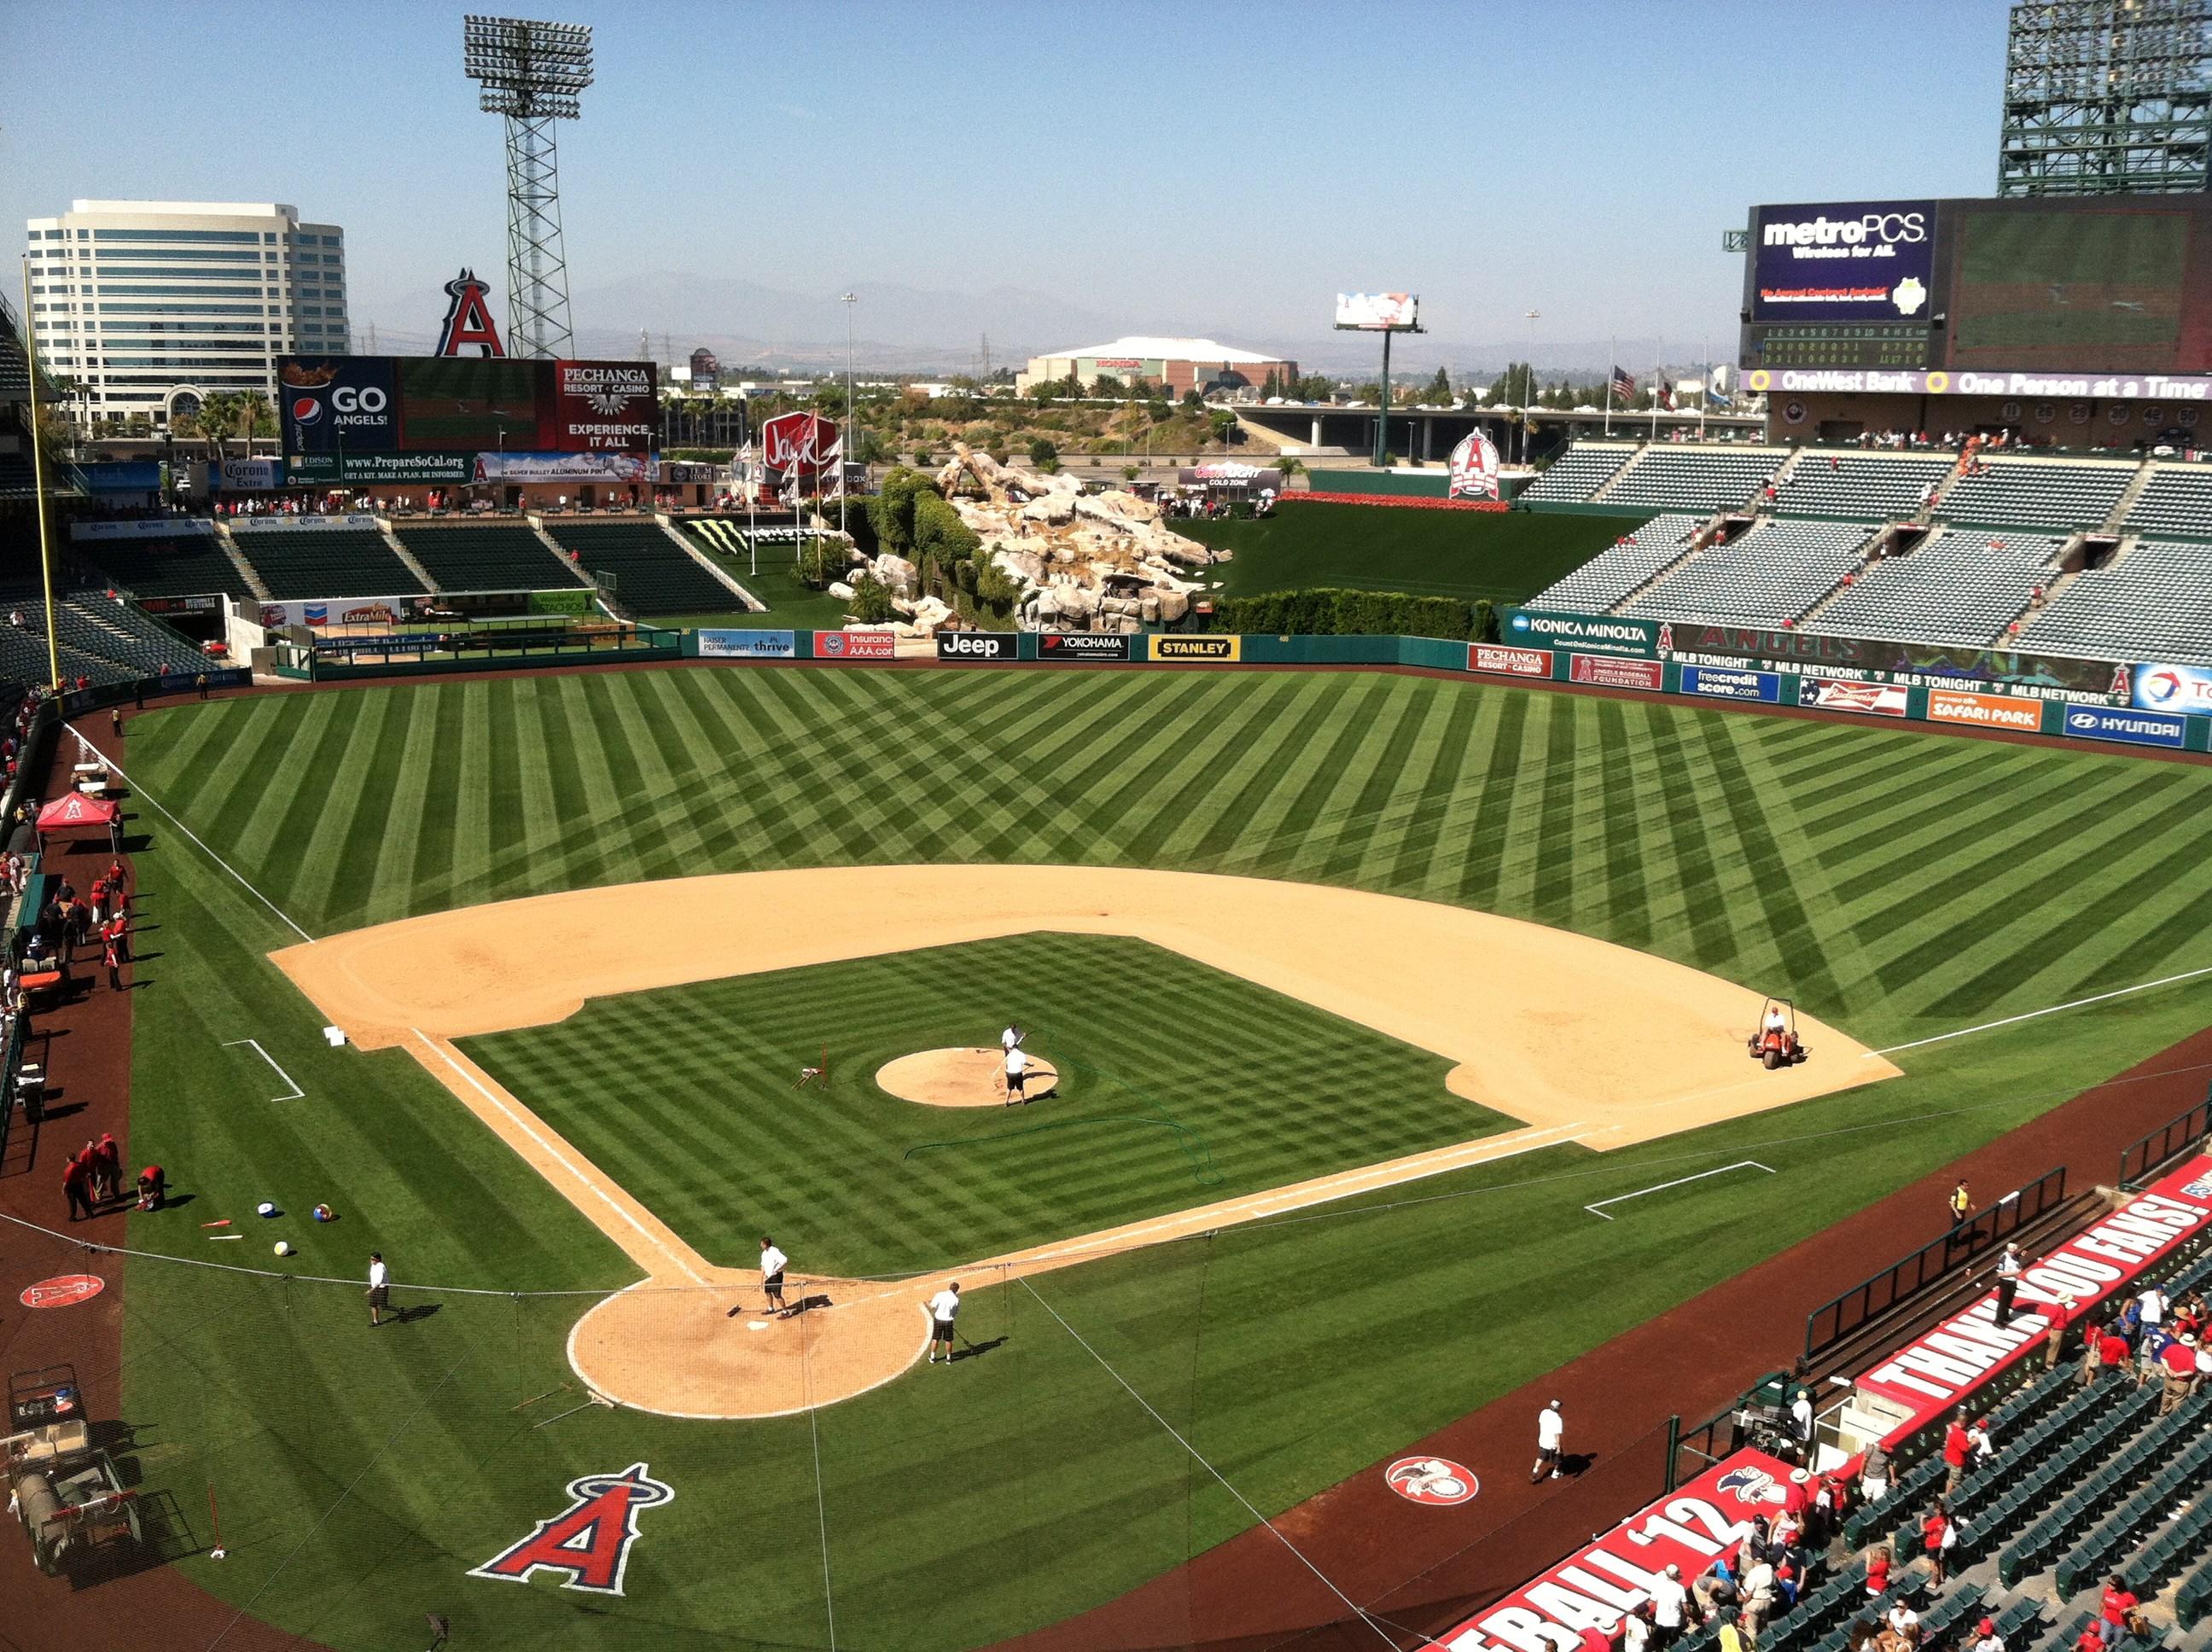 Angels Baseball Stadium Wallpaper The field of angel stadium by